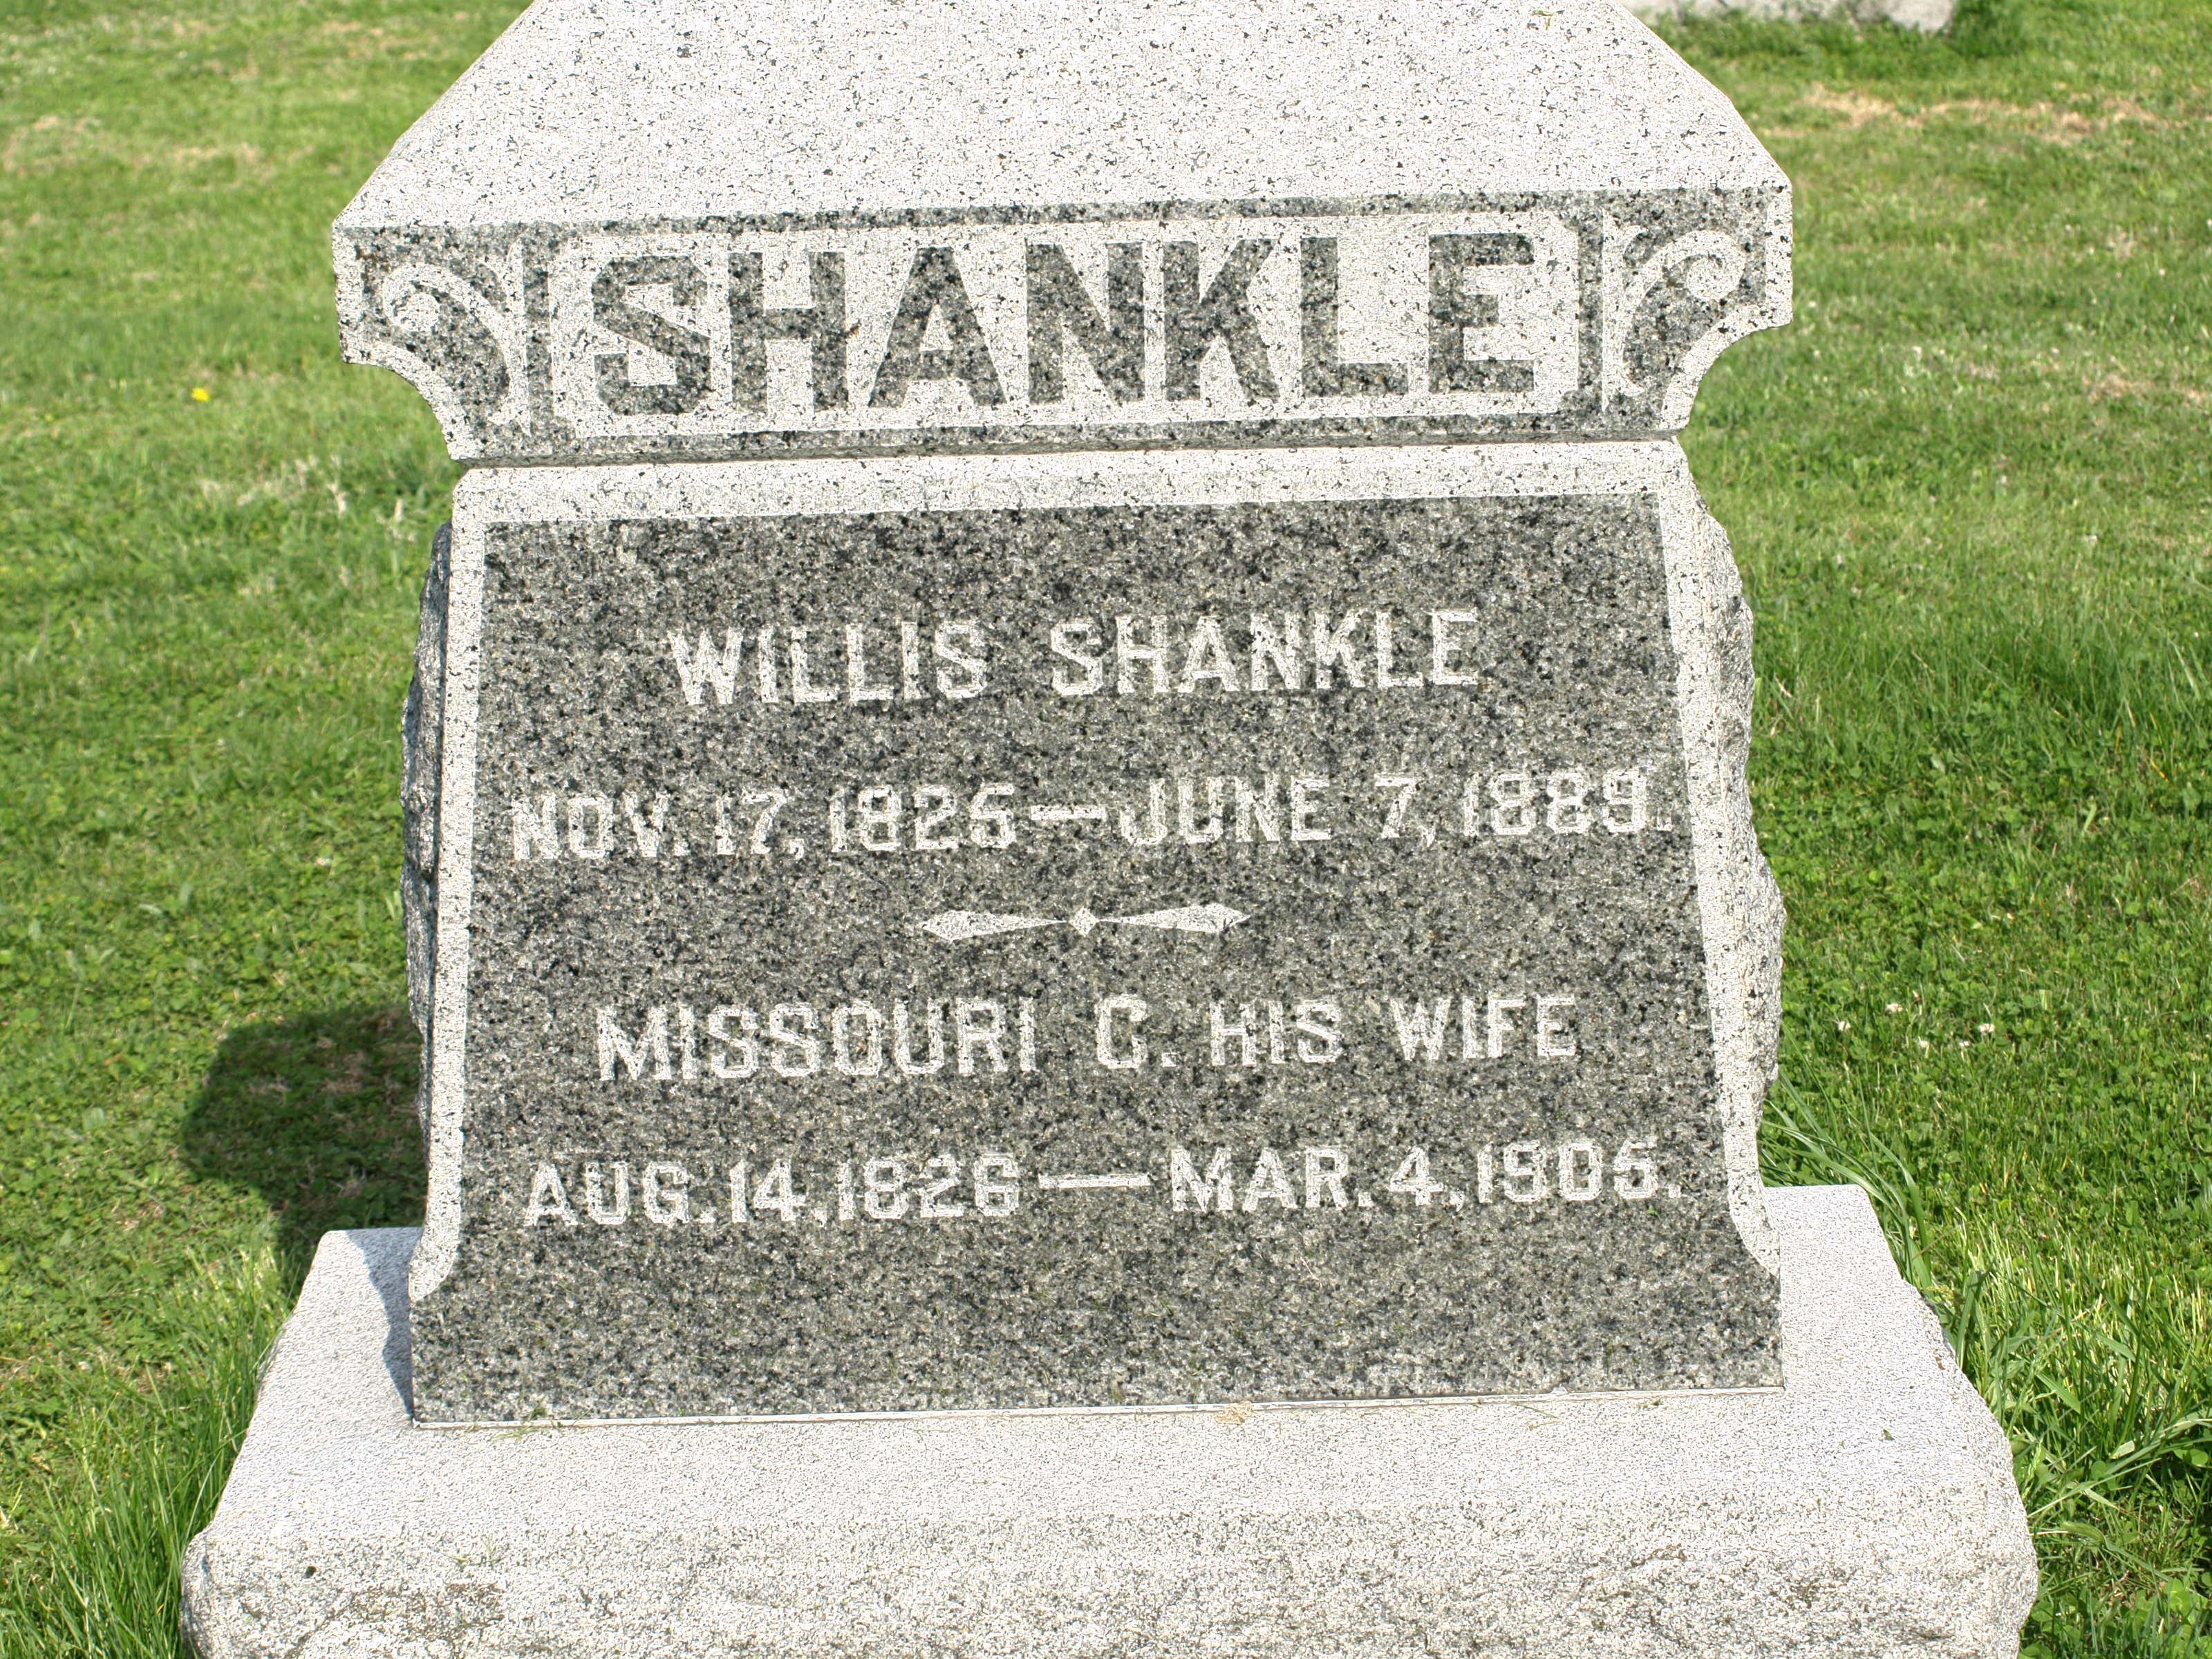 Shankle, Willis